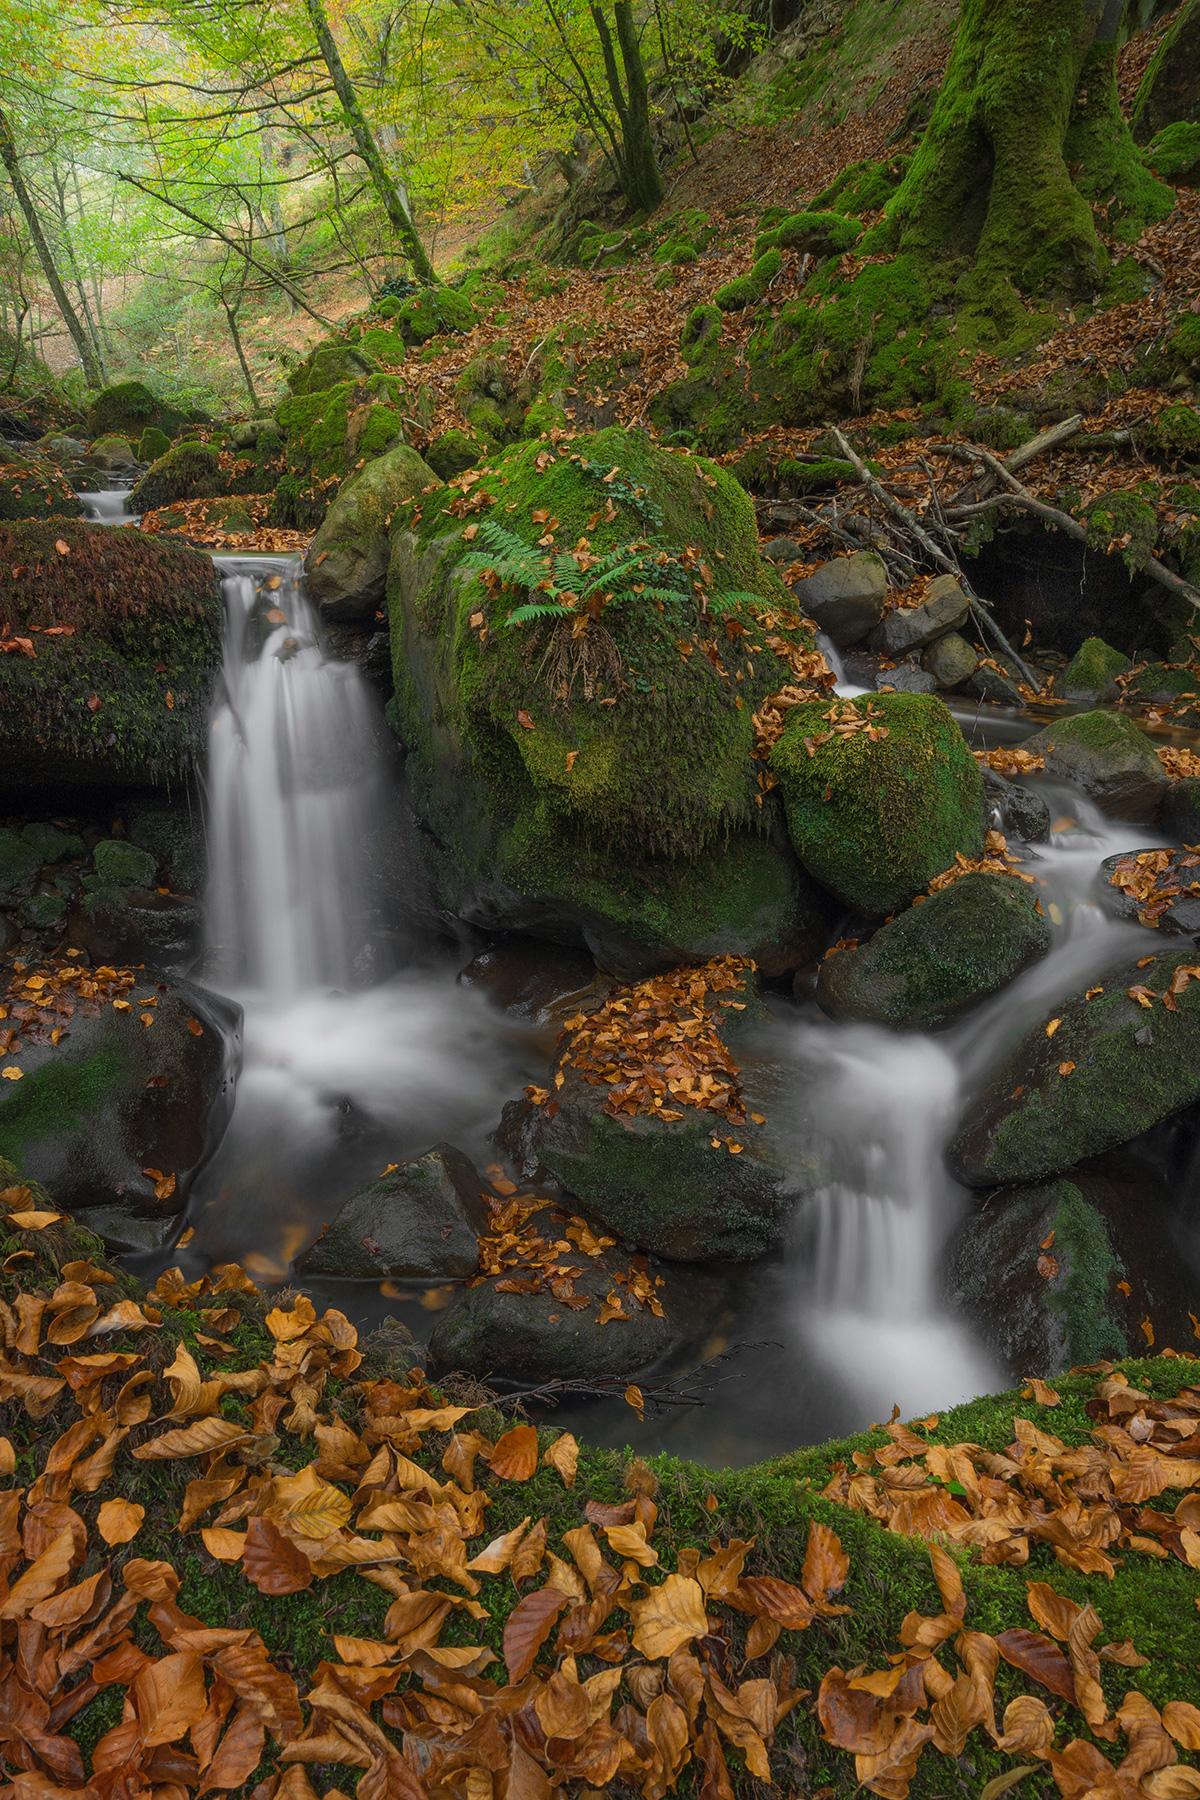 Anibal_Carmona-Autumn